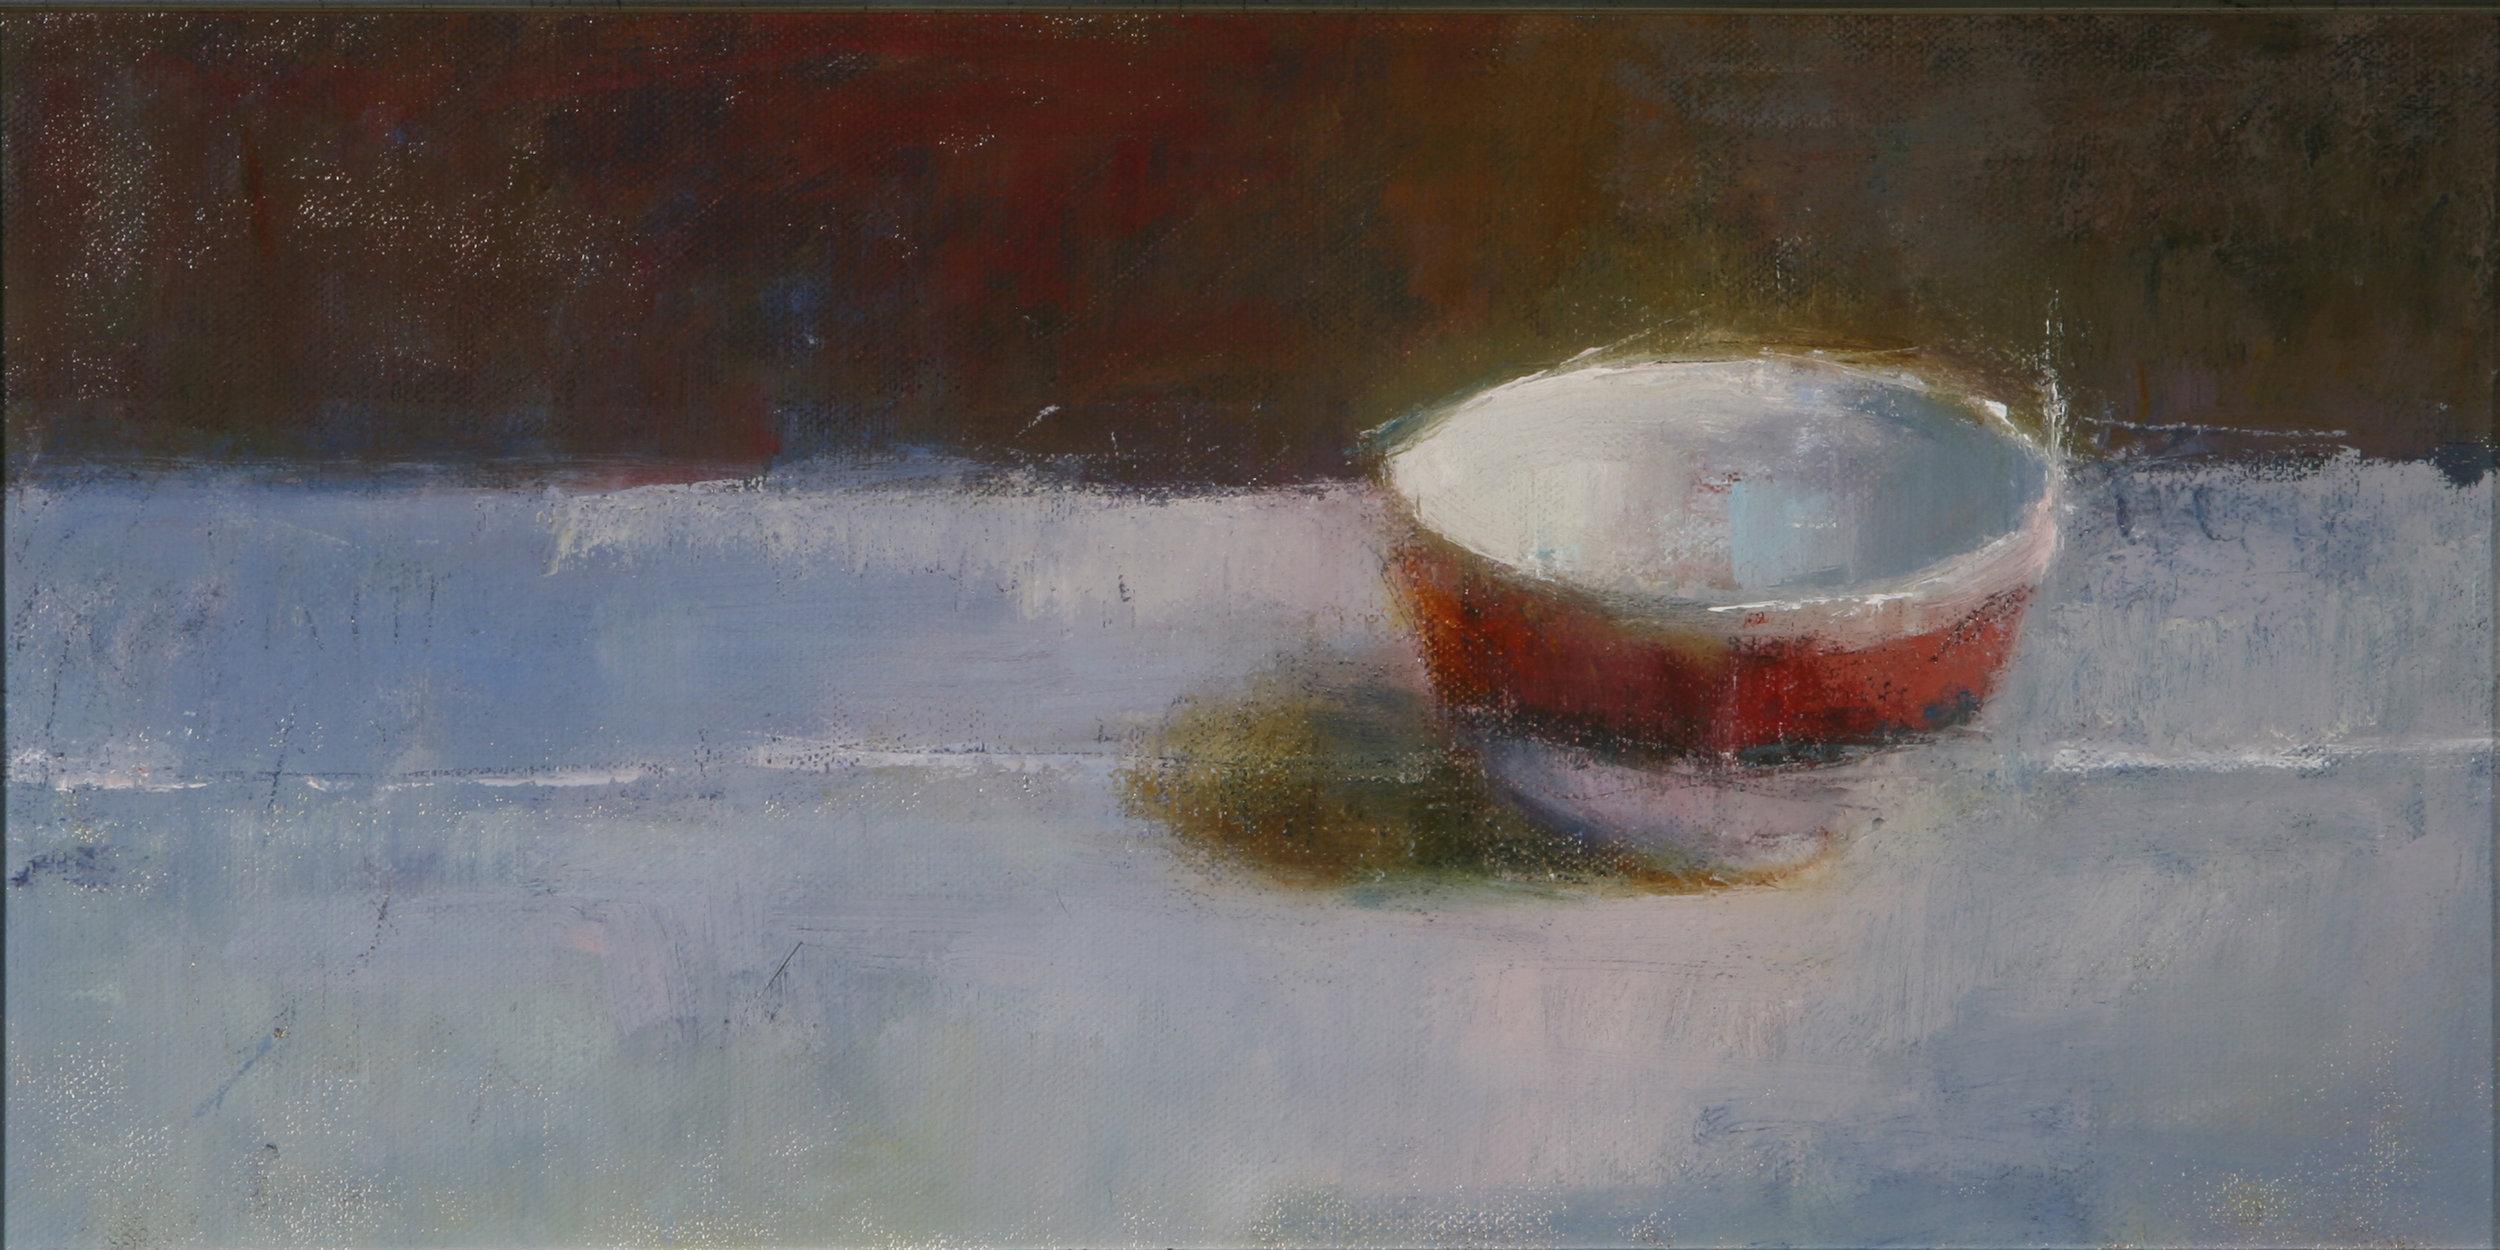 rice-bowl-chen.jpg